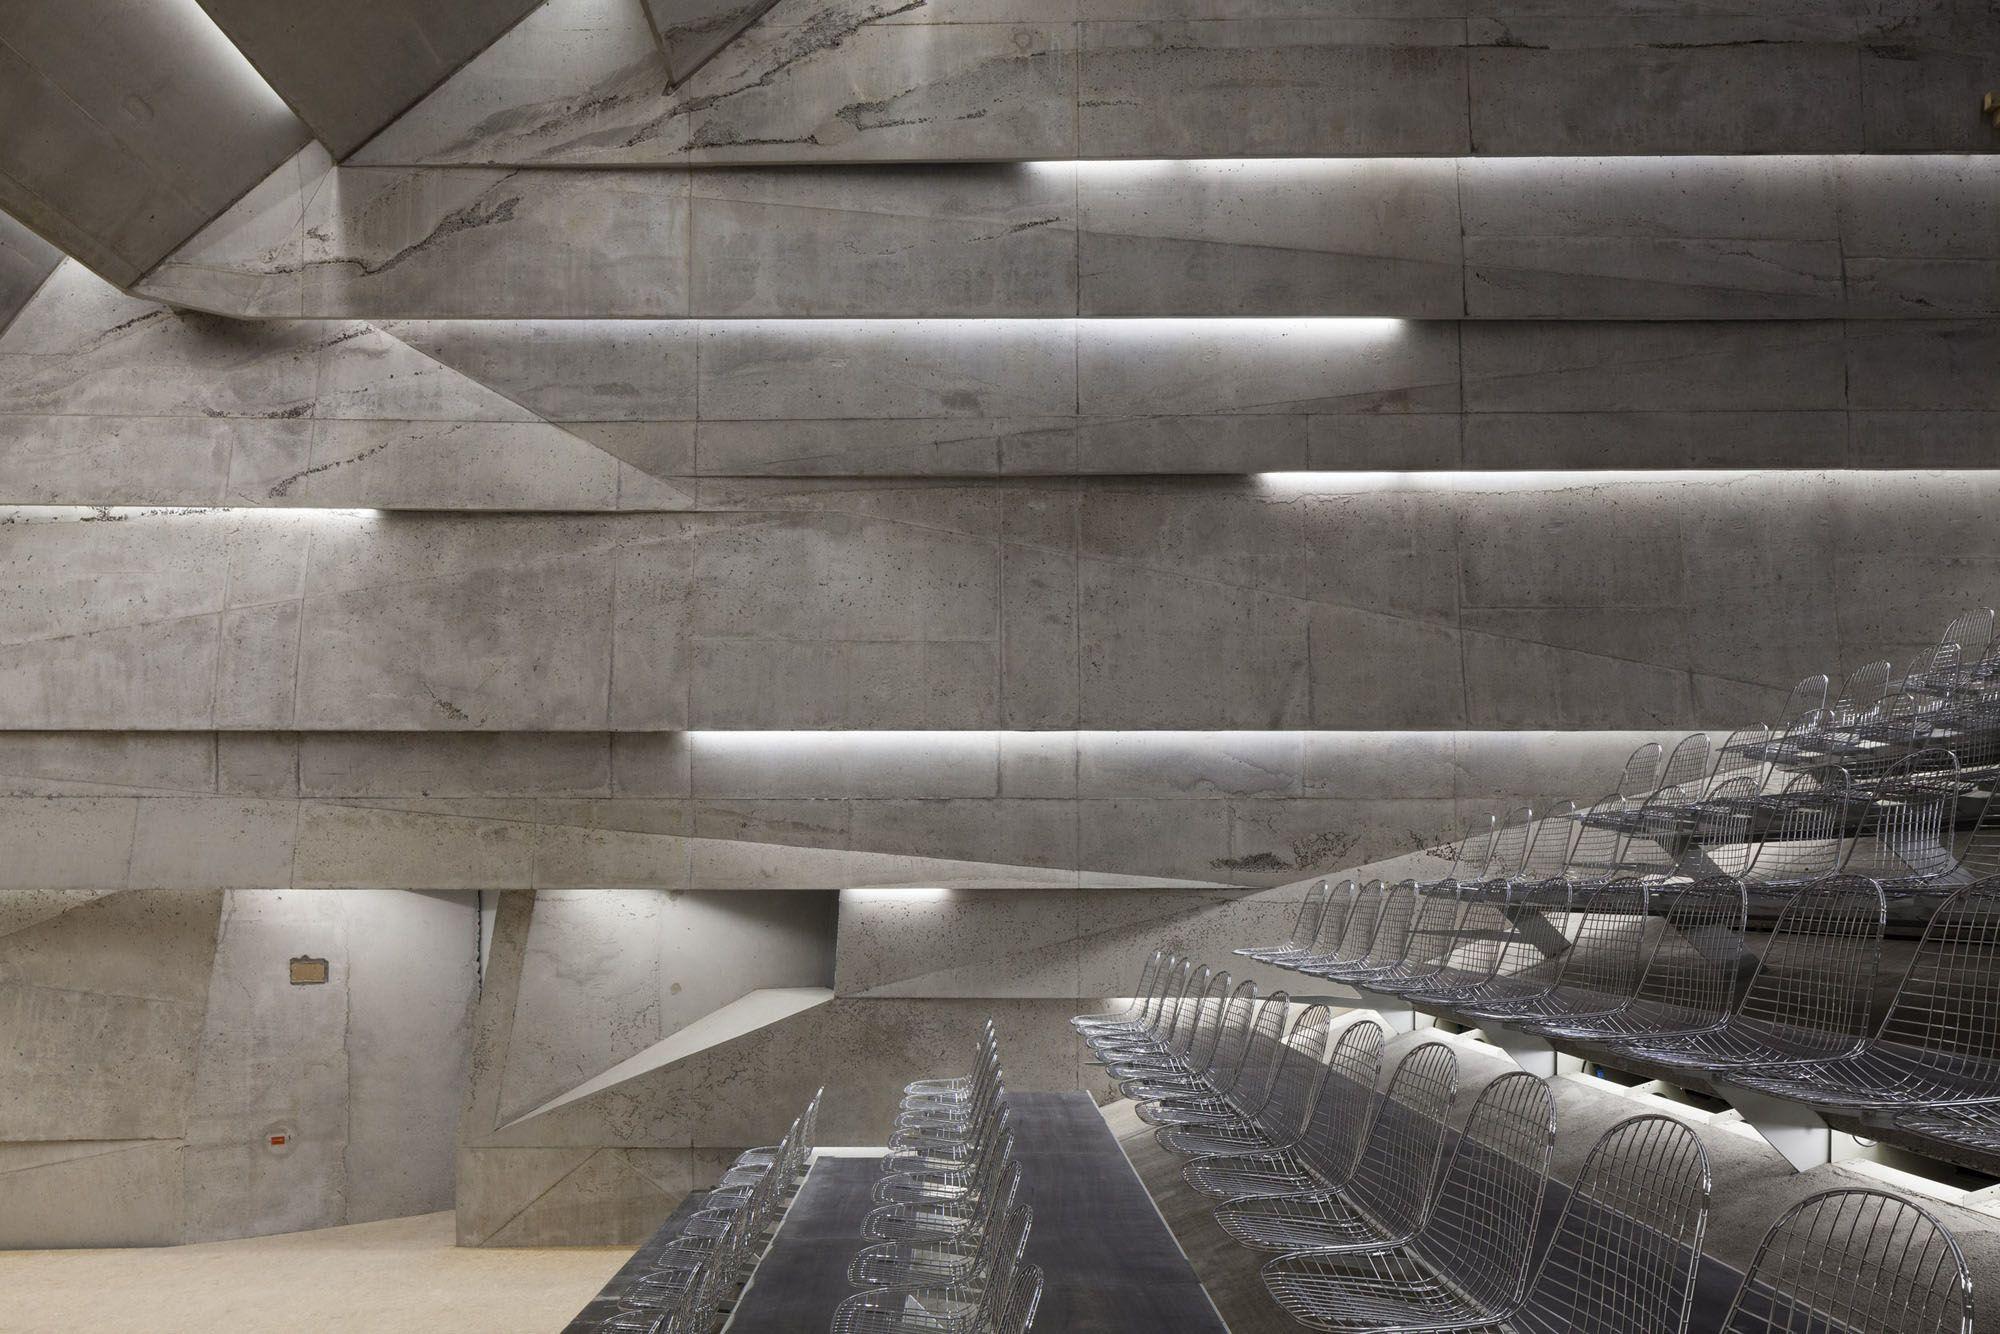 sala-concertos-blaibach-peter-haimerl-architektur (10)